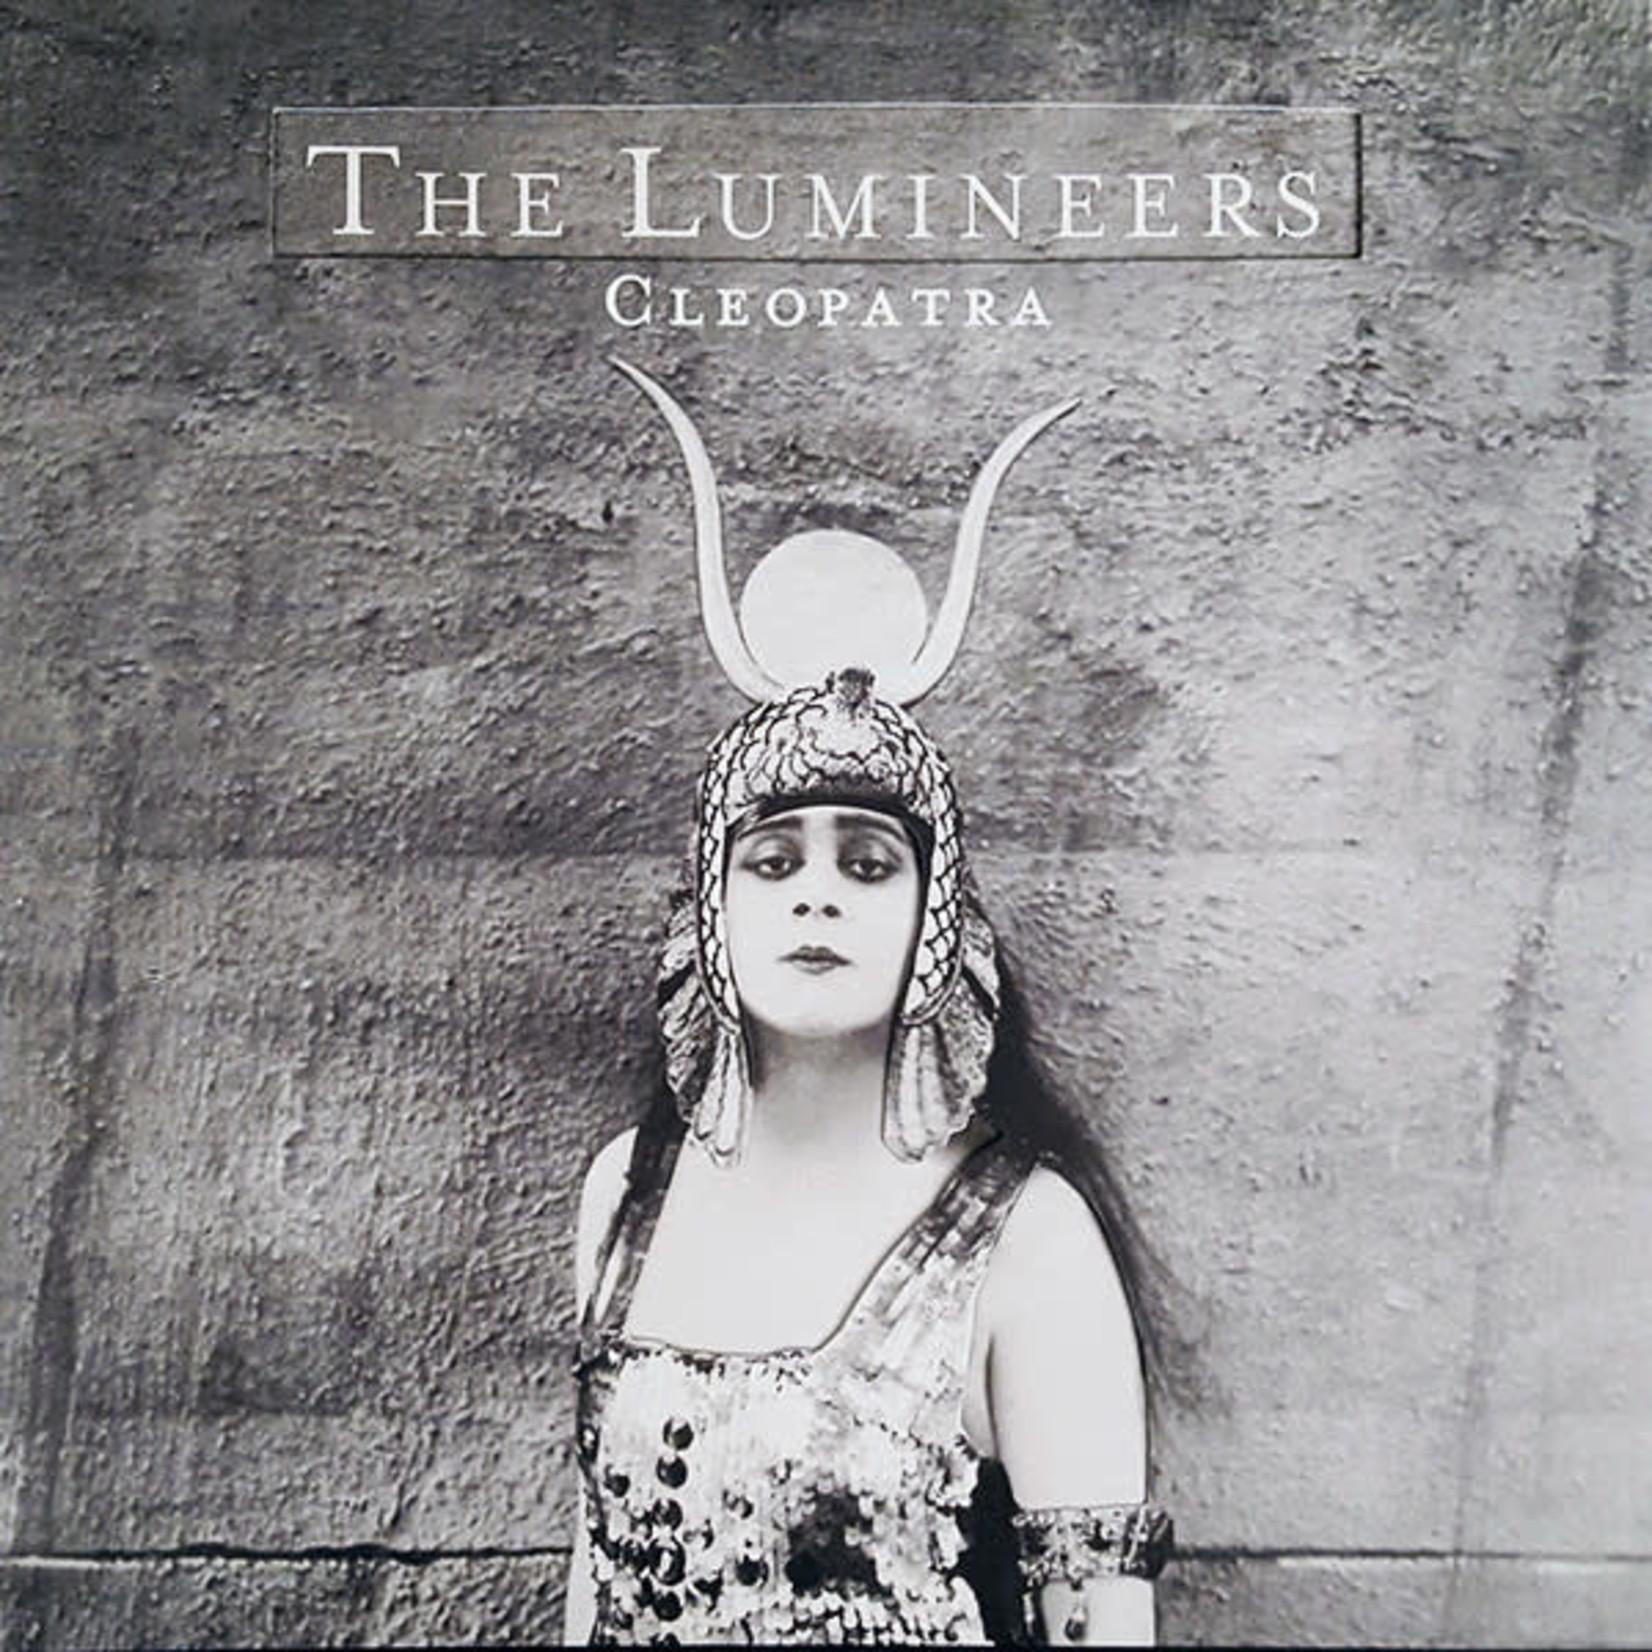 [New] Lumineers: Cleopatra (2LP, 180g)